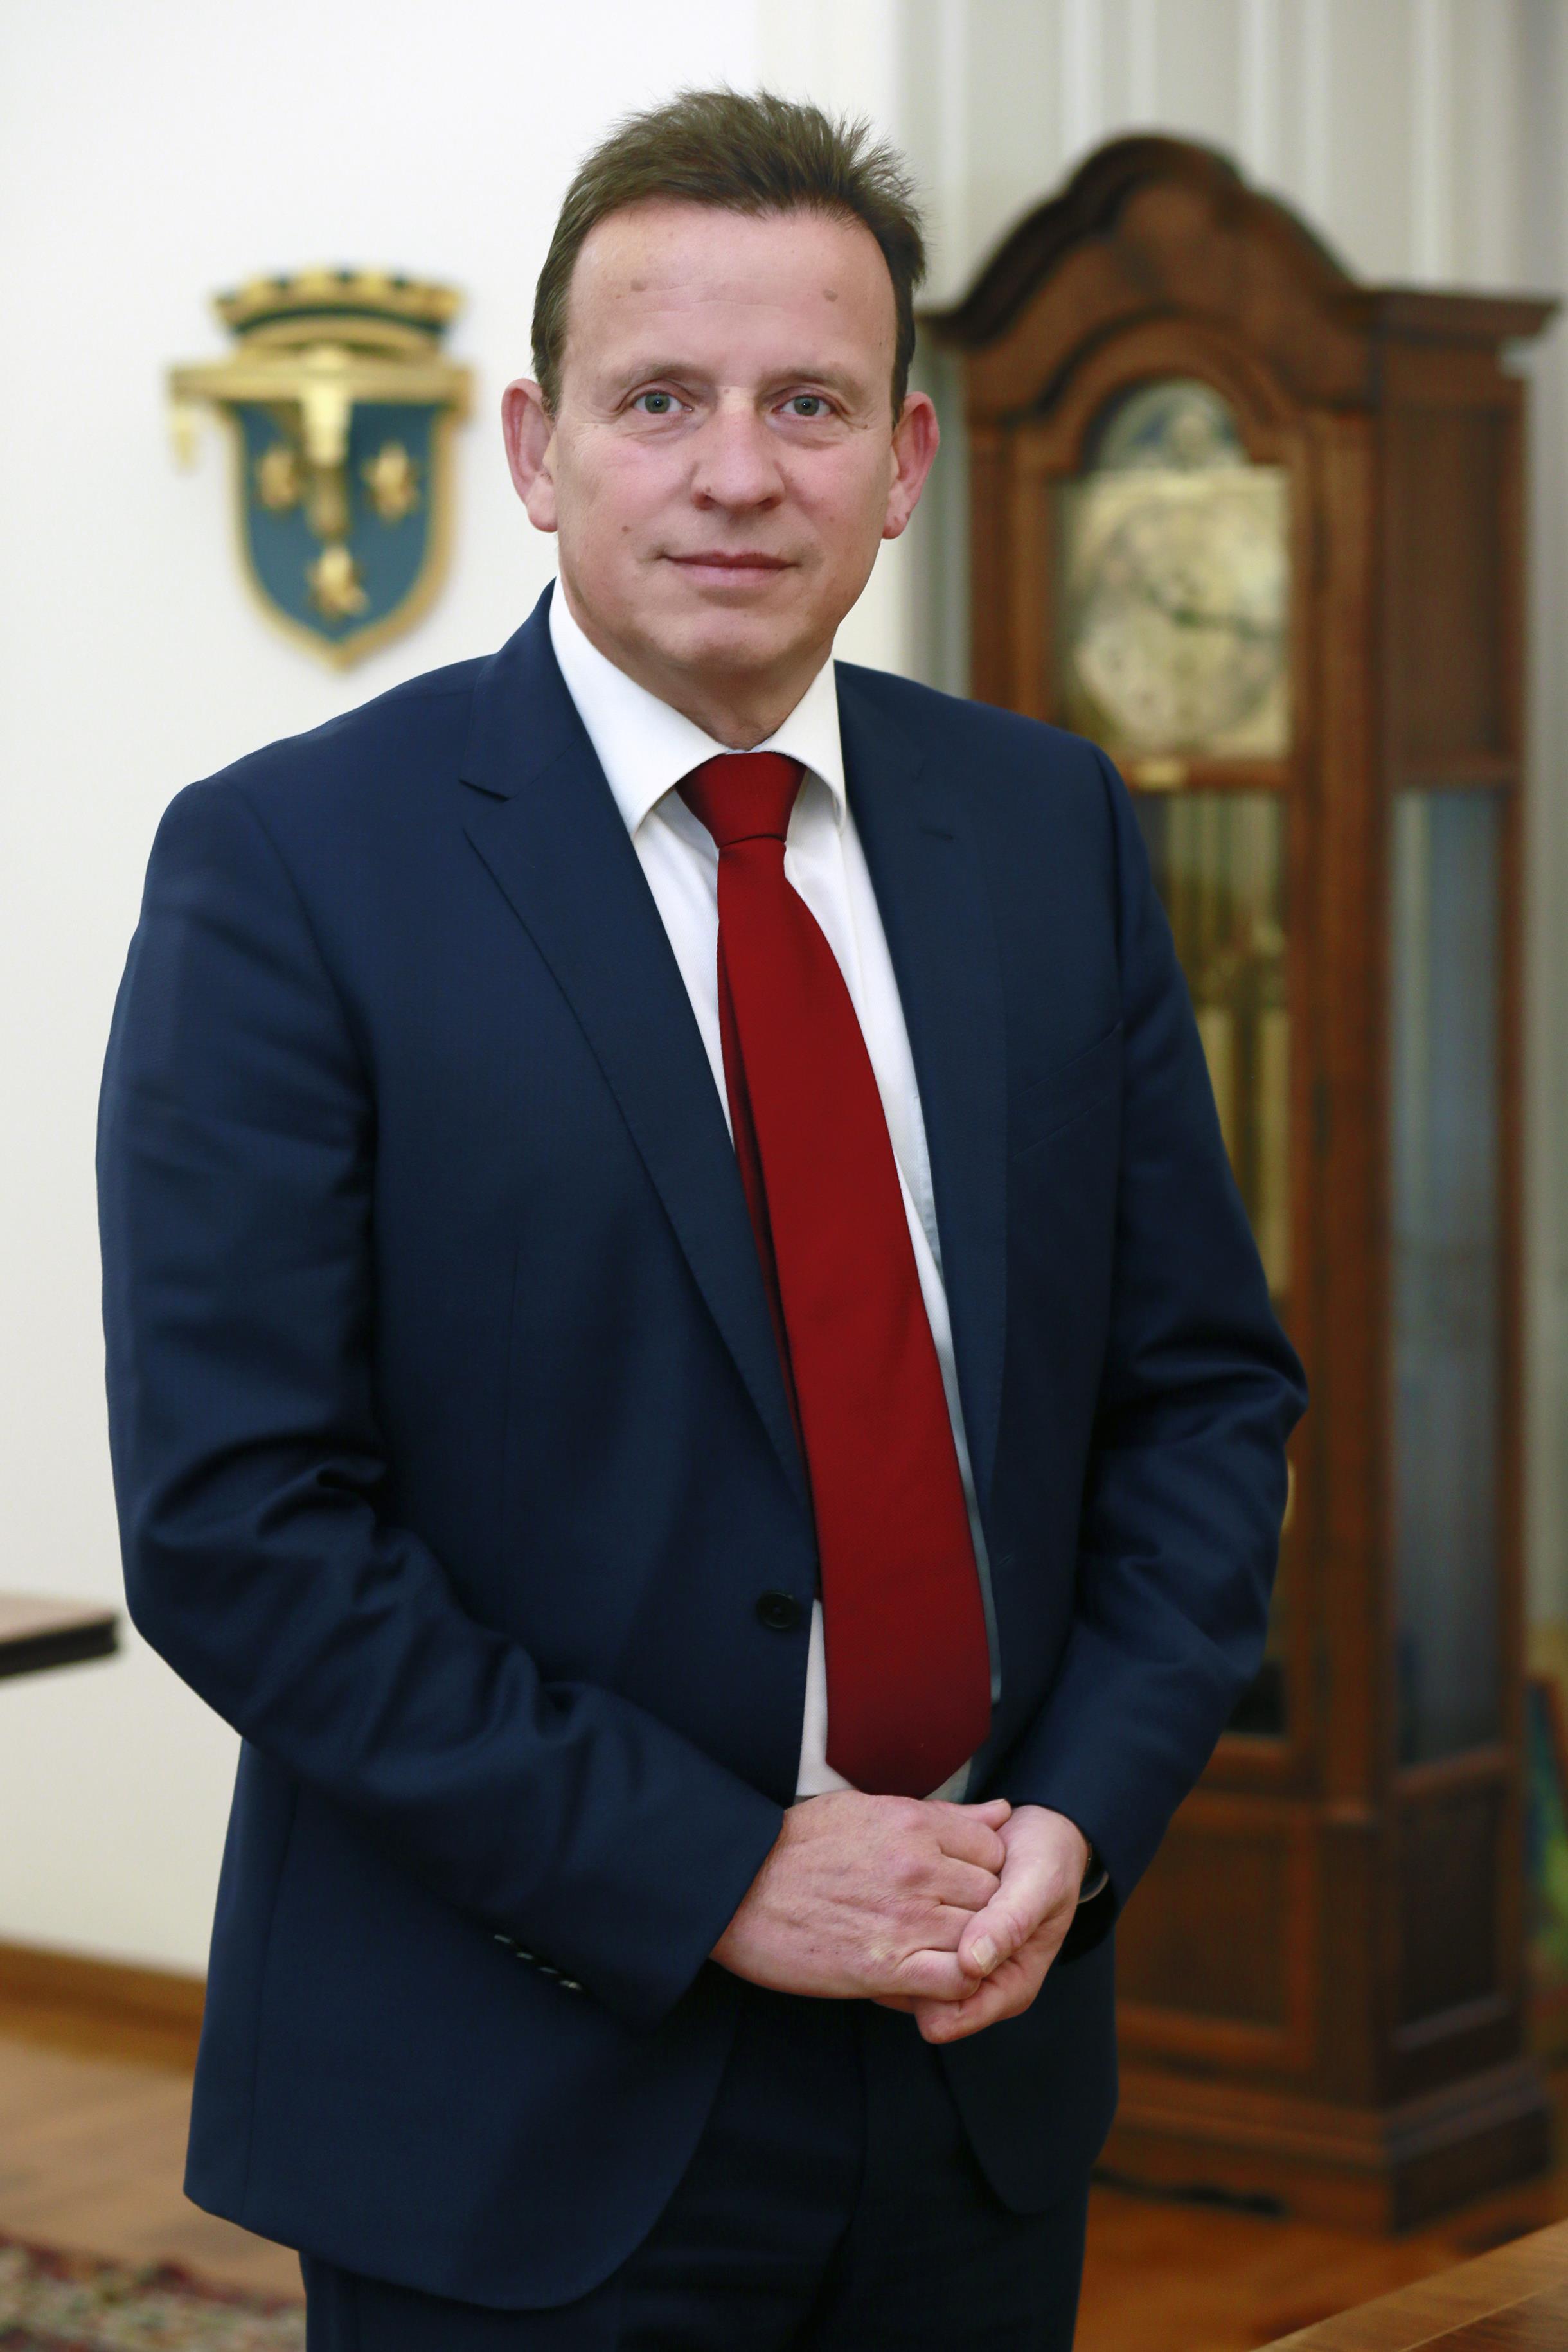 Župan Bojan Šrot